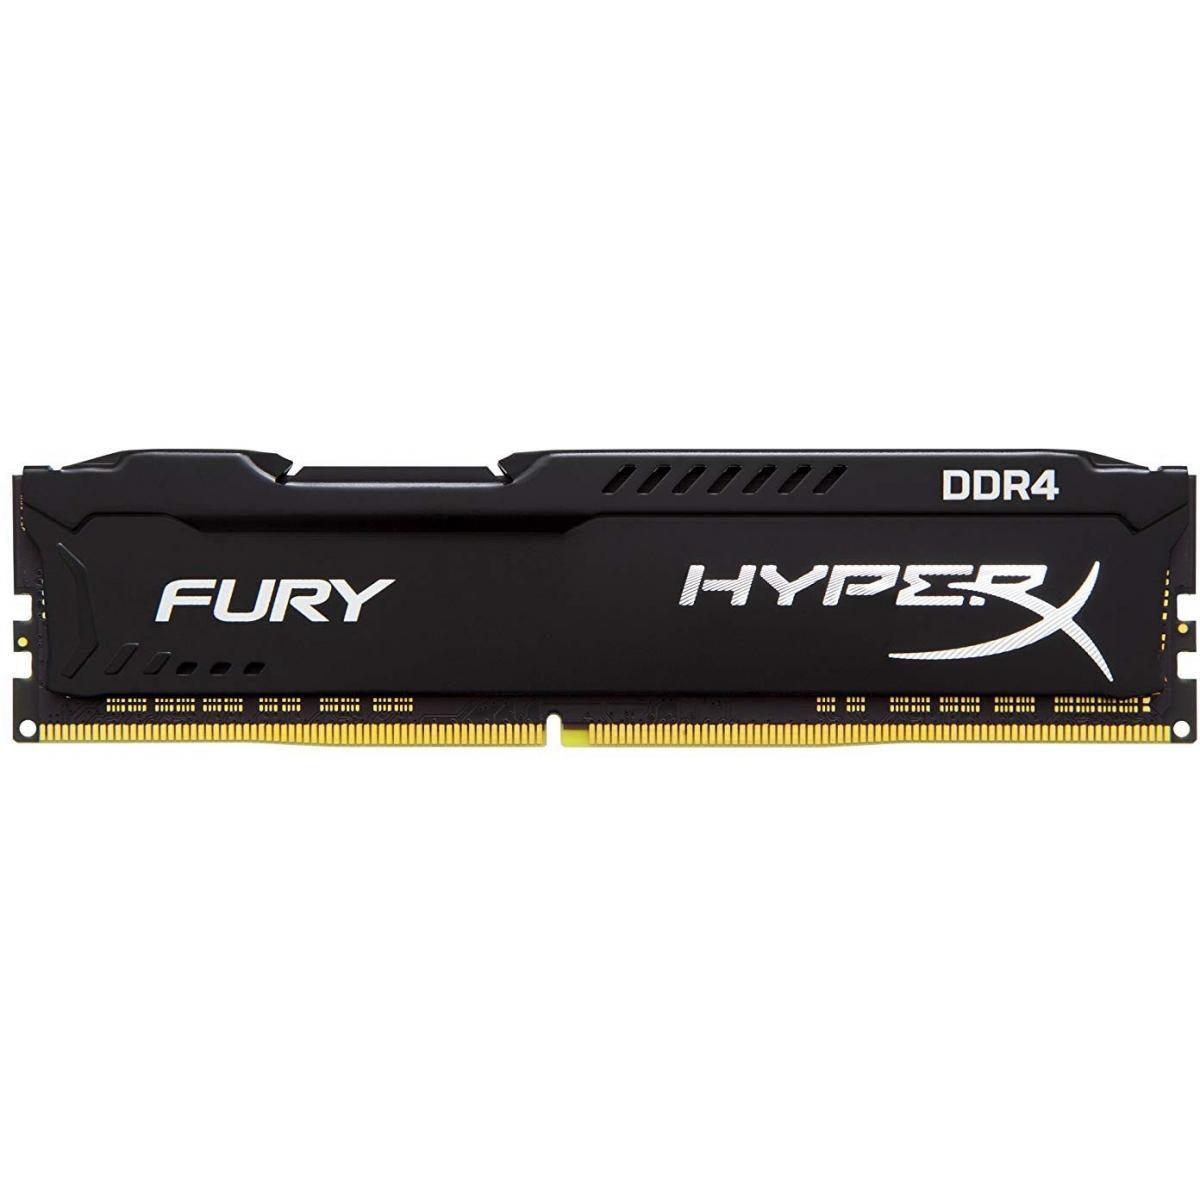 Memória DDR4 Kingston HyperX Fury, 32GB (2x16GB) 3200MHz, HX432C18FBK2/32